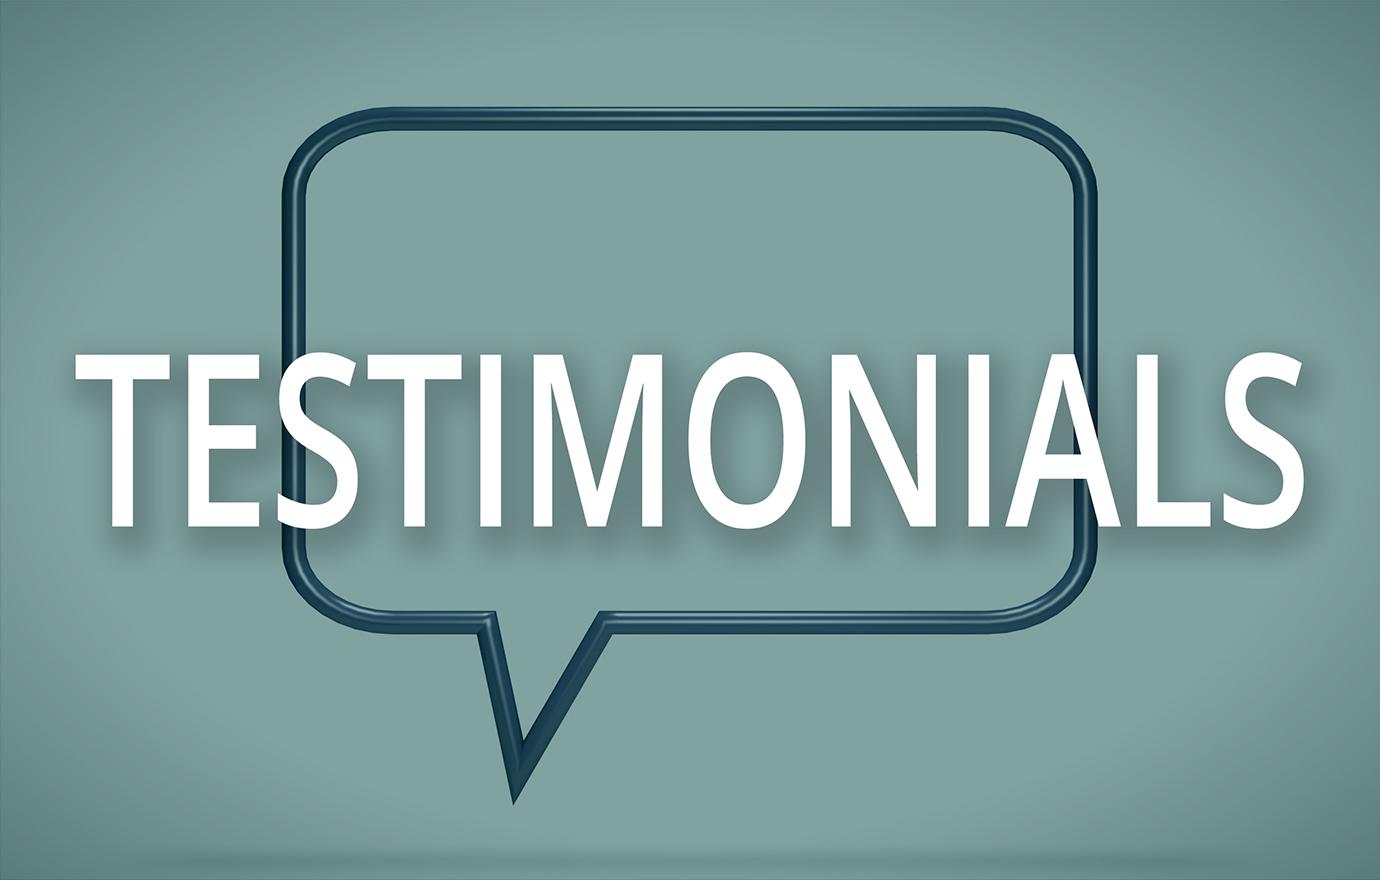 testimonials-teal